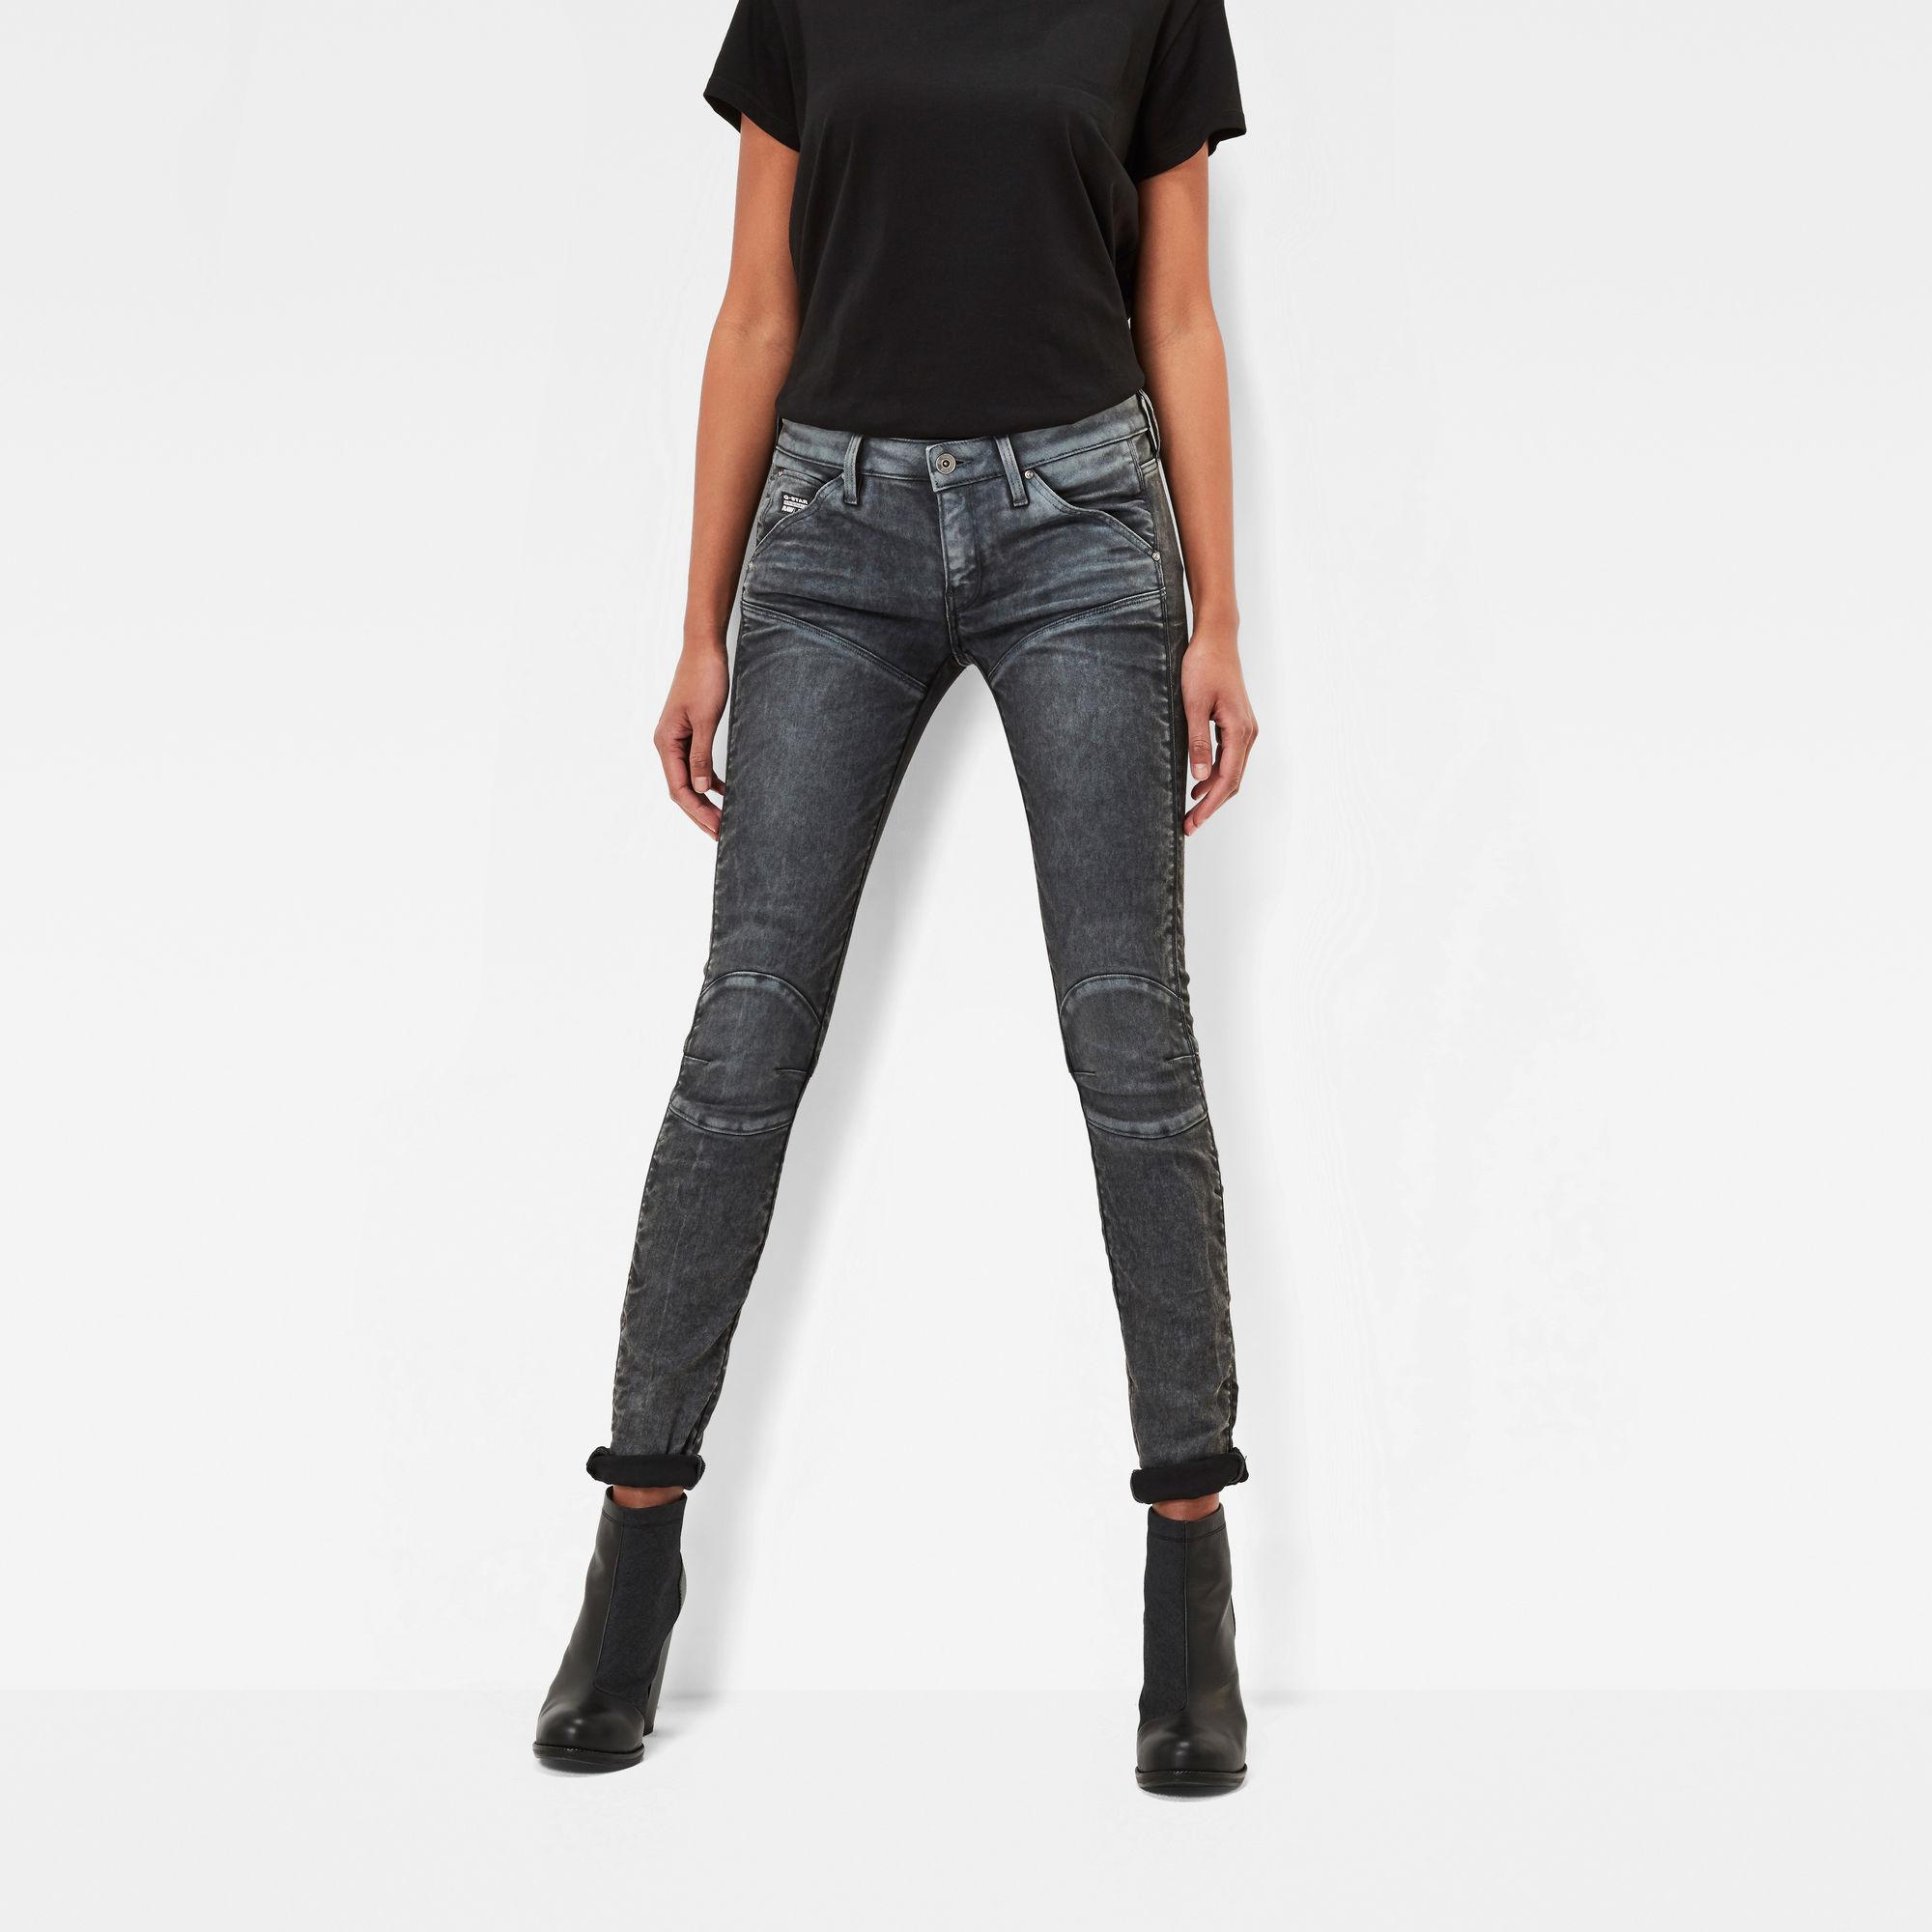 5620 G-Star Elwood 3D Mid Waist Skinny Jeans